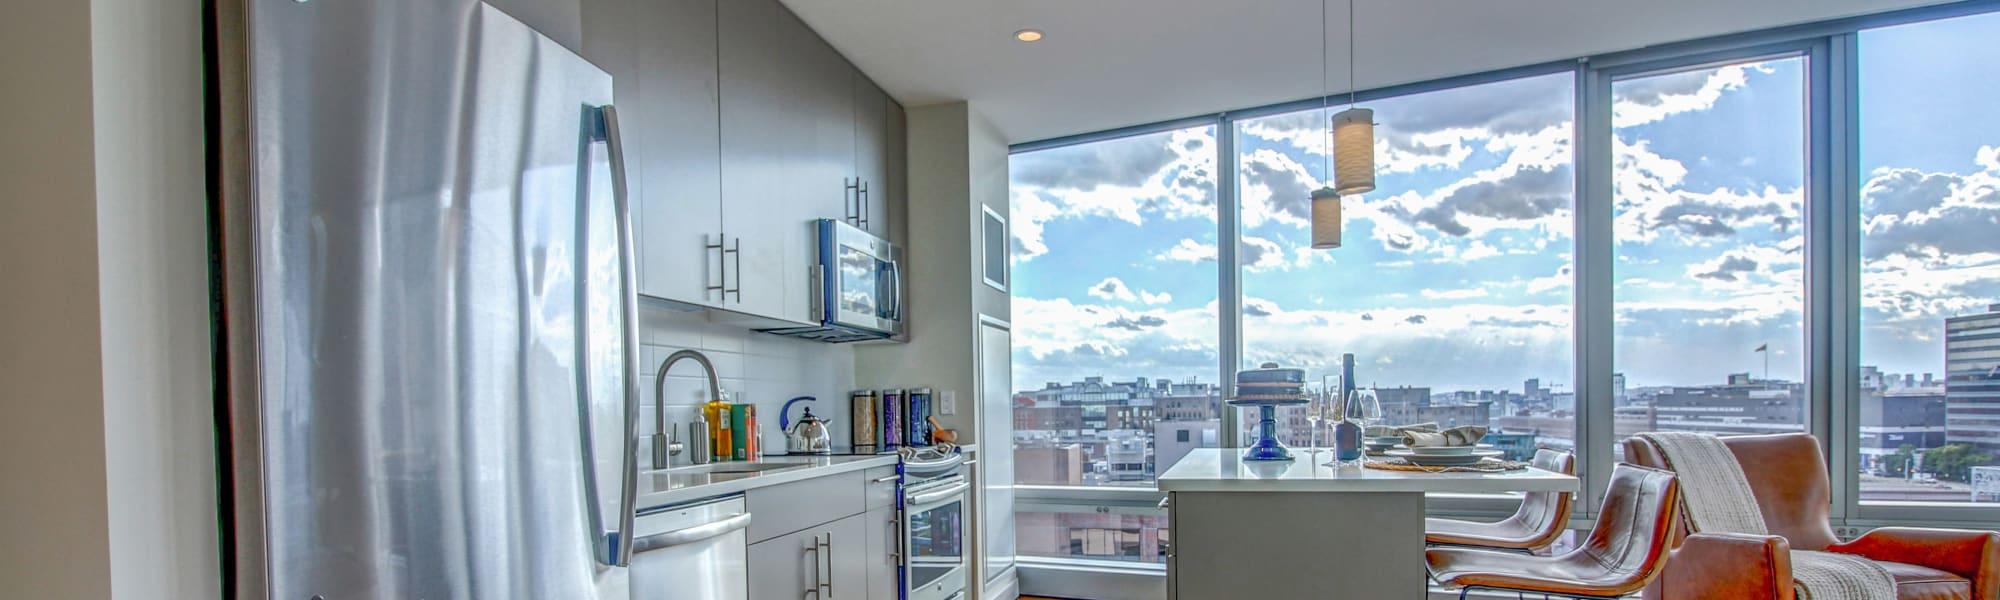 apartment features at The Benjamin